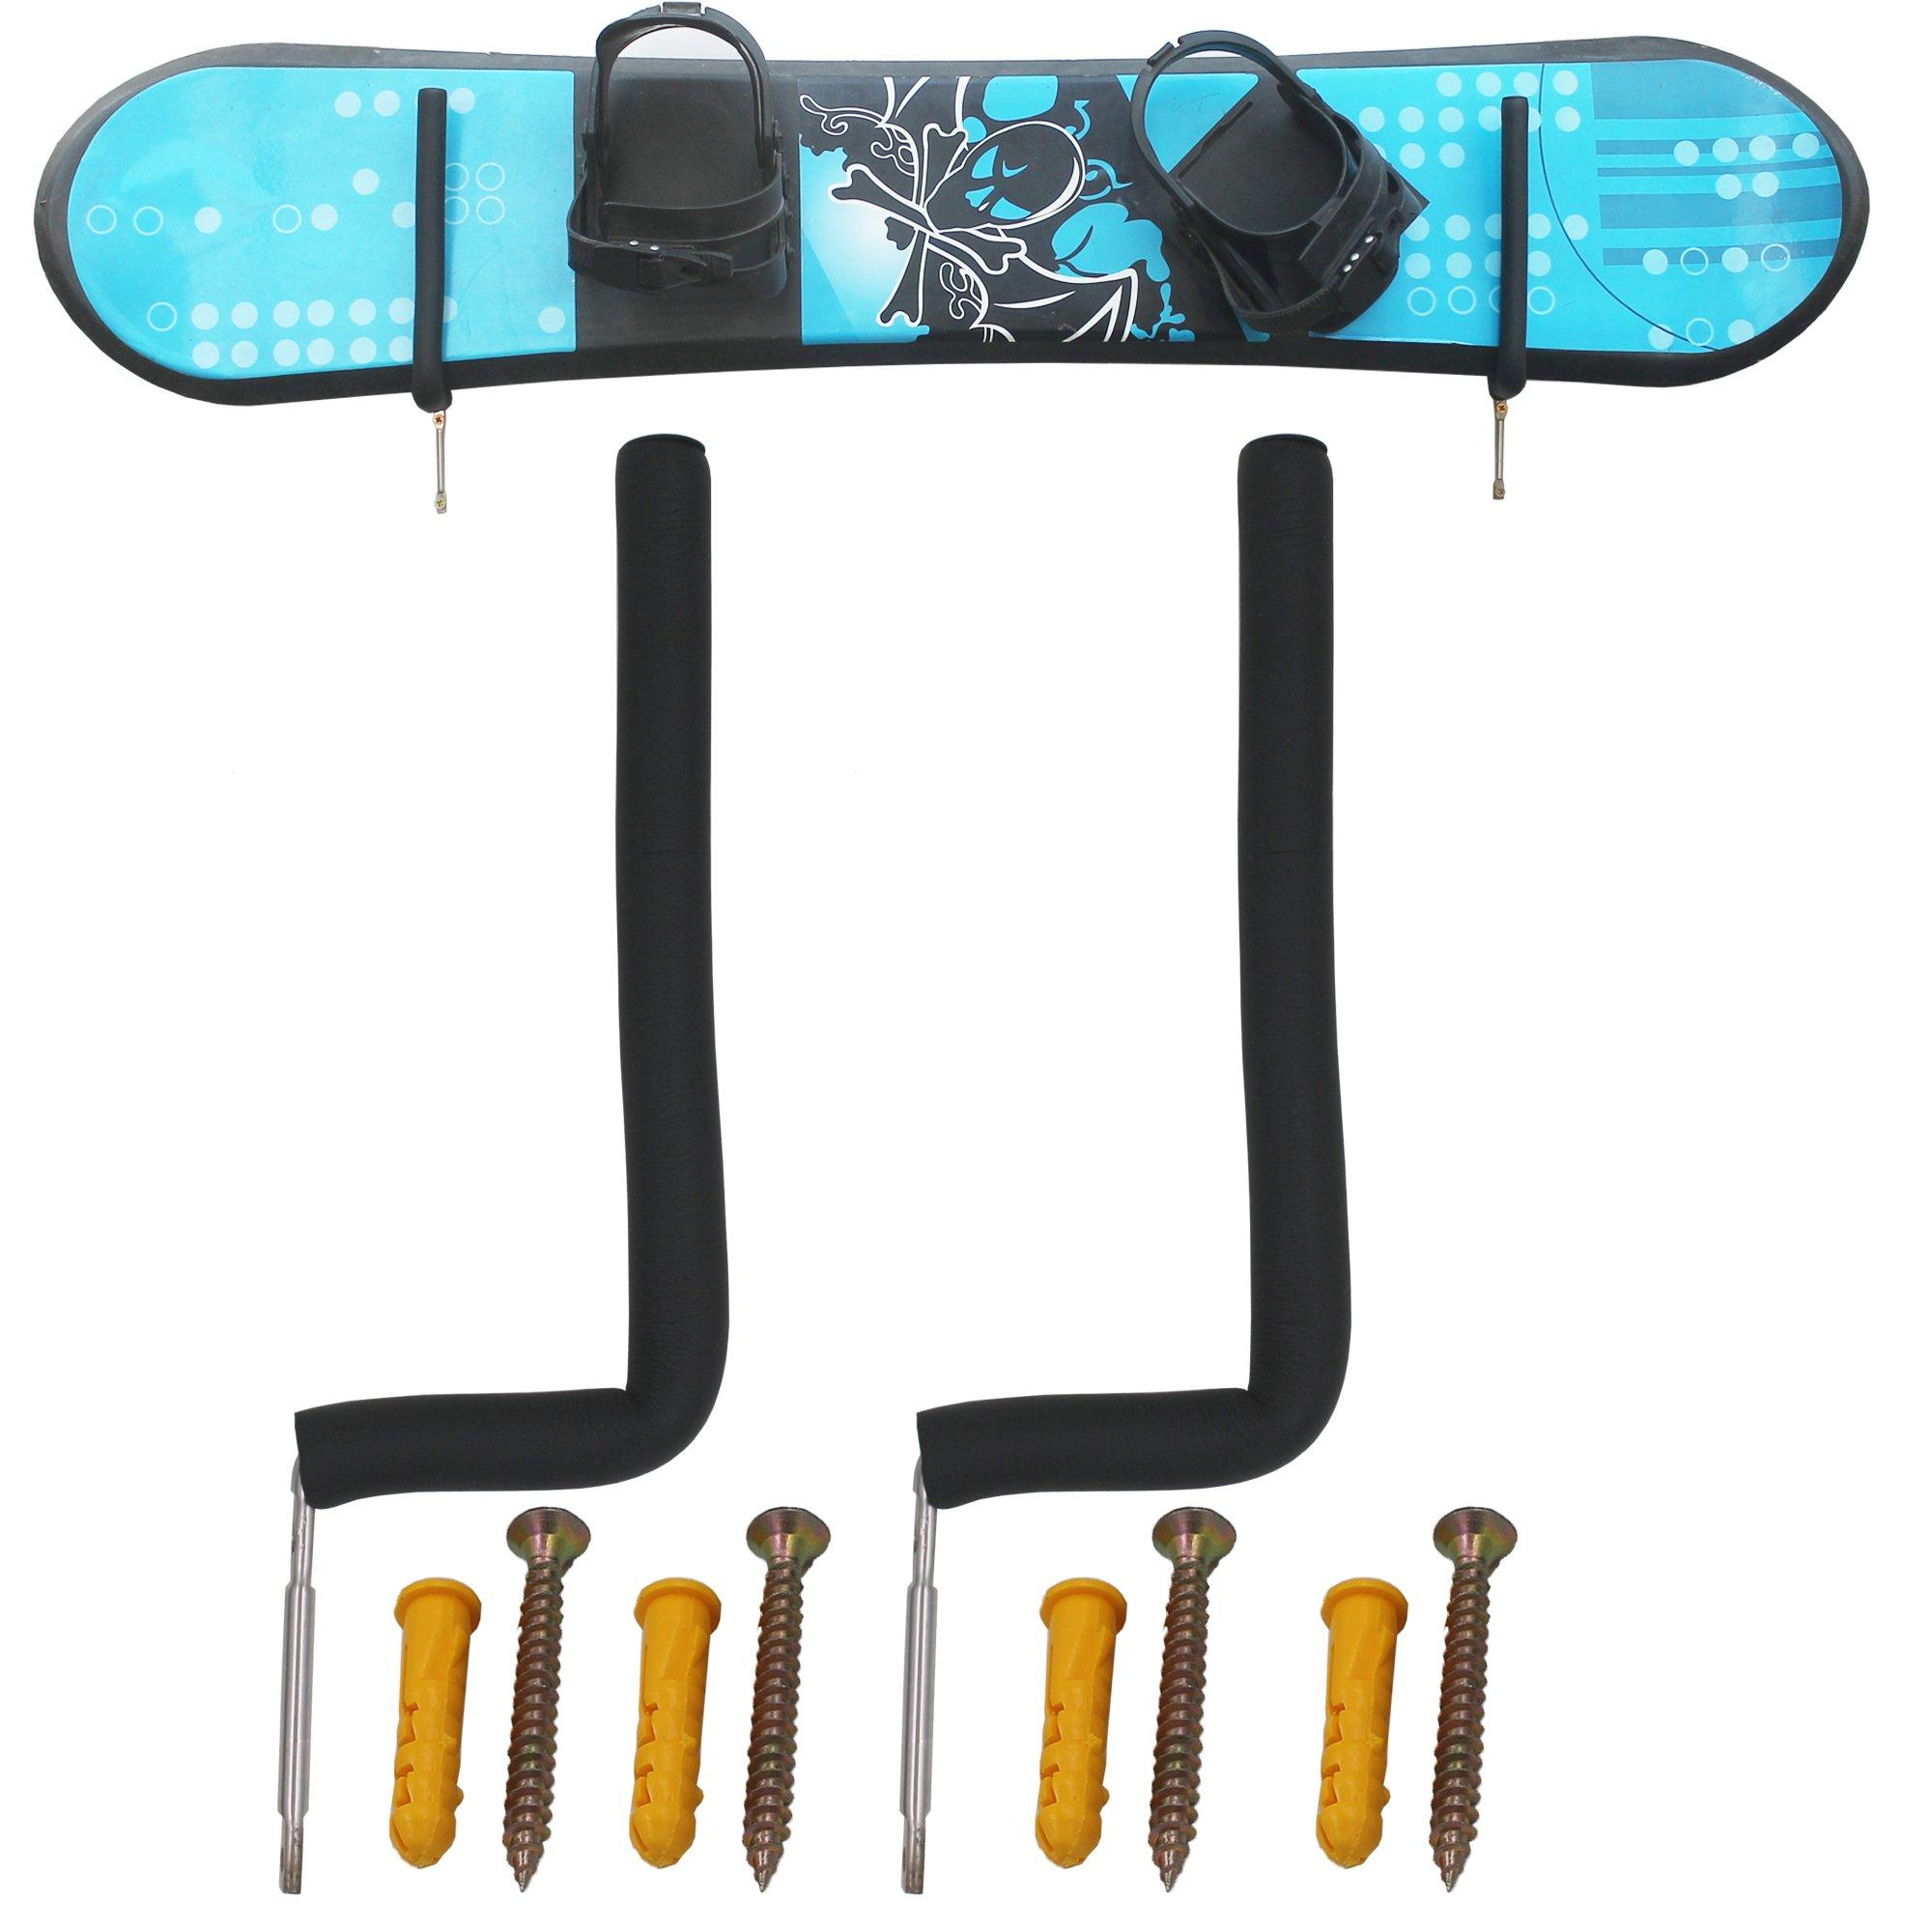 YYST Stainless Steel Snowboard Wall Rack Snowboard Wall Mount Horizontal Display - No Board